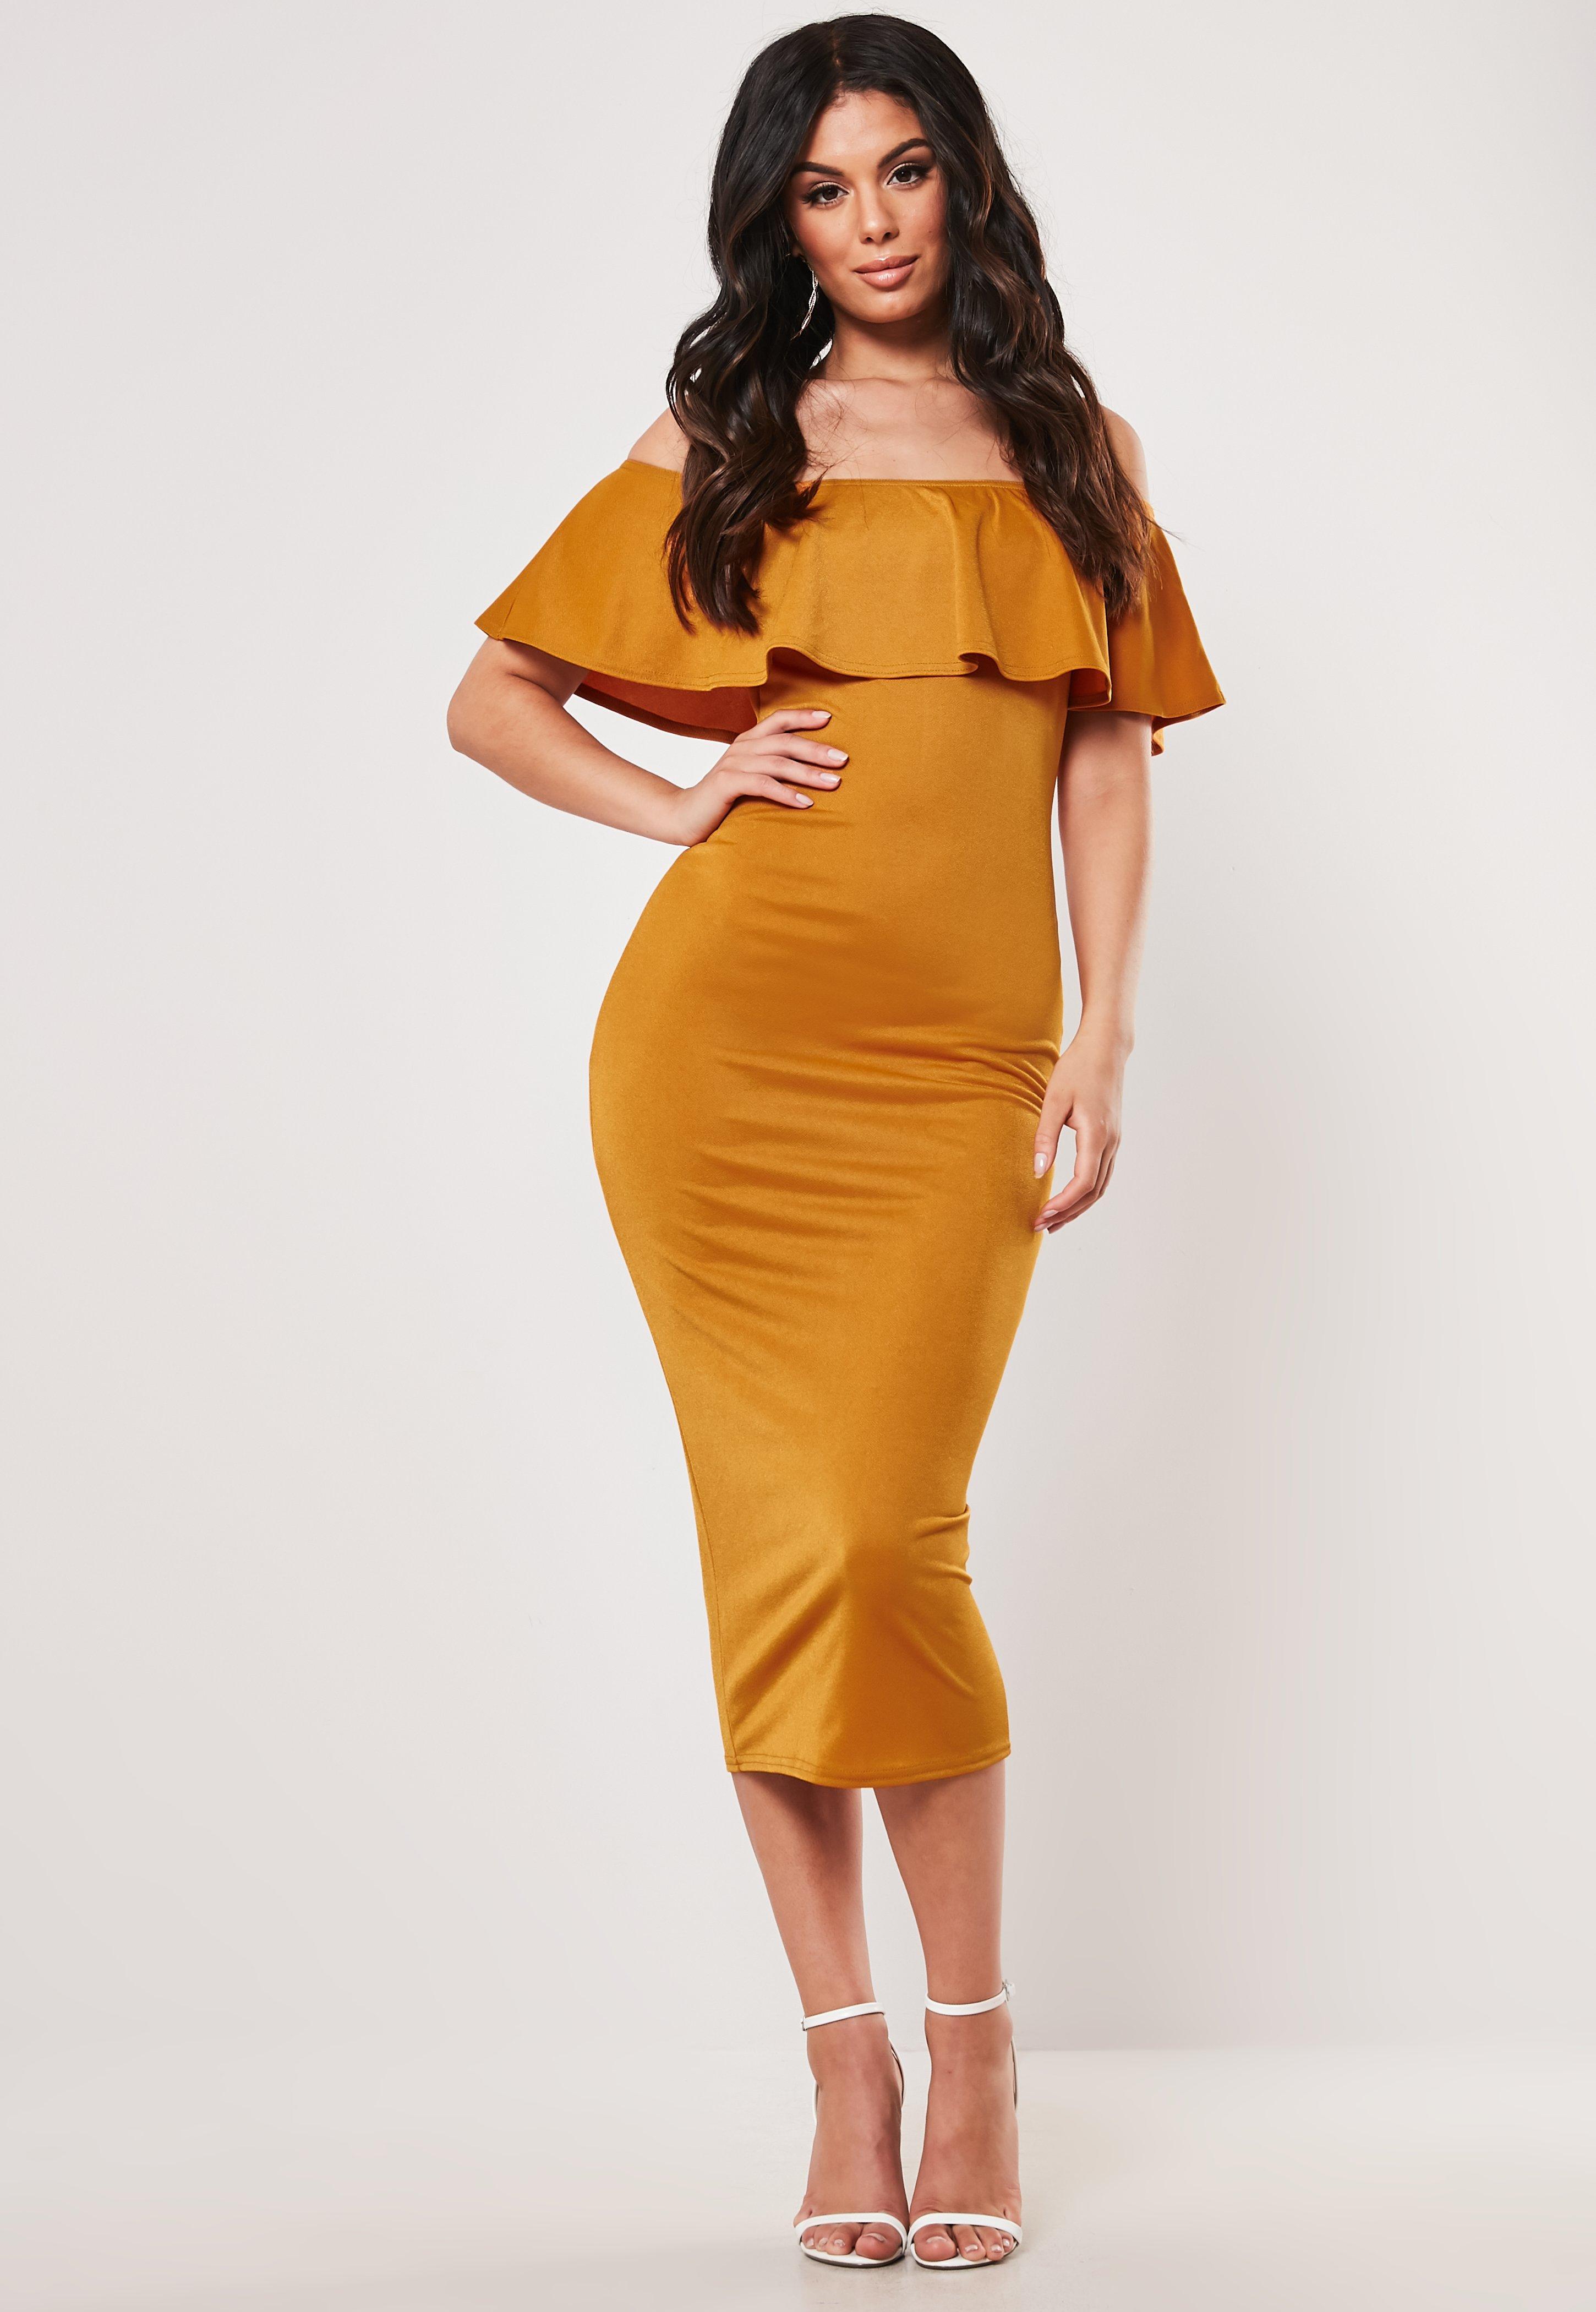 6d29bf1b5f7e Bardot Dresses   Off The Shoulder Dresses - Missguided Australia